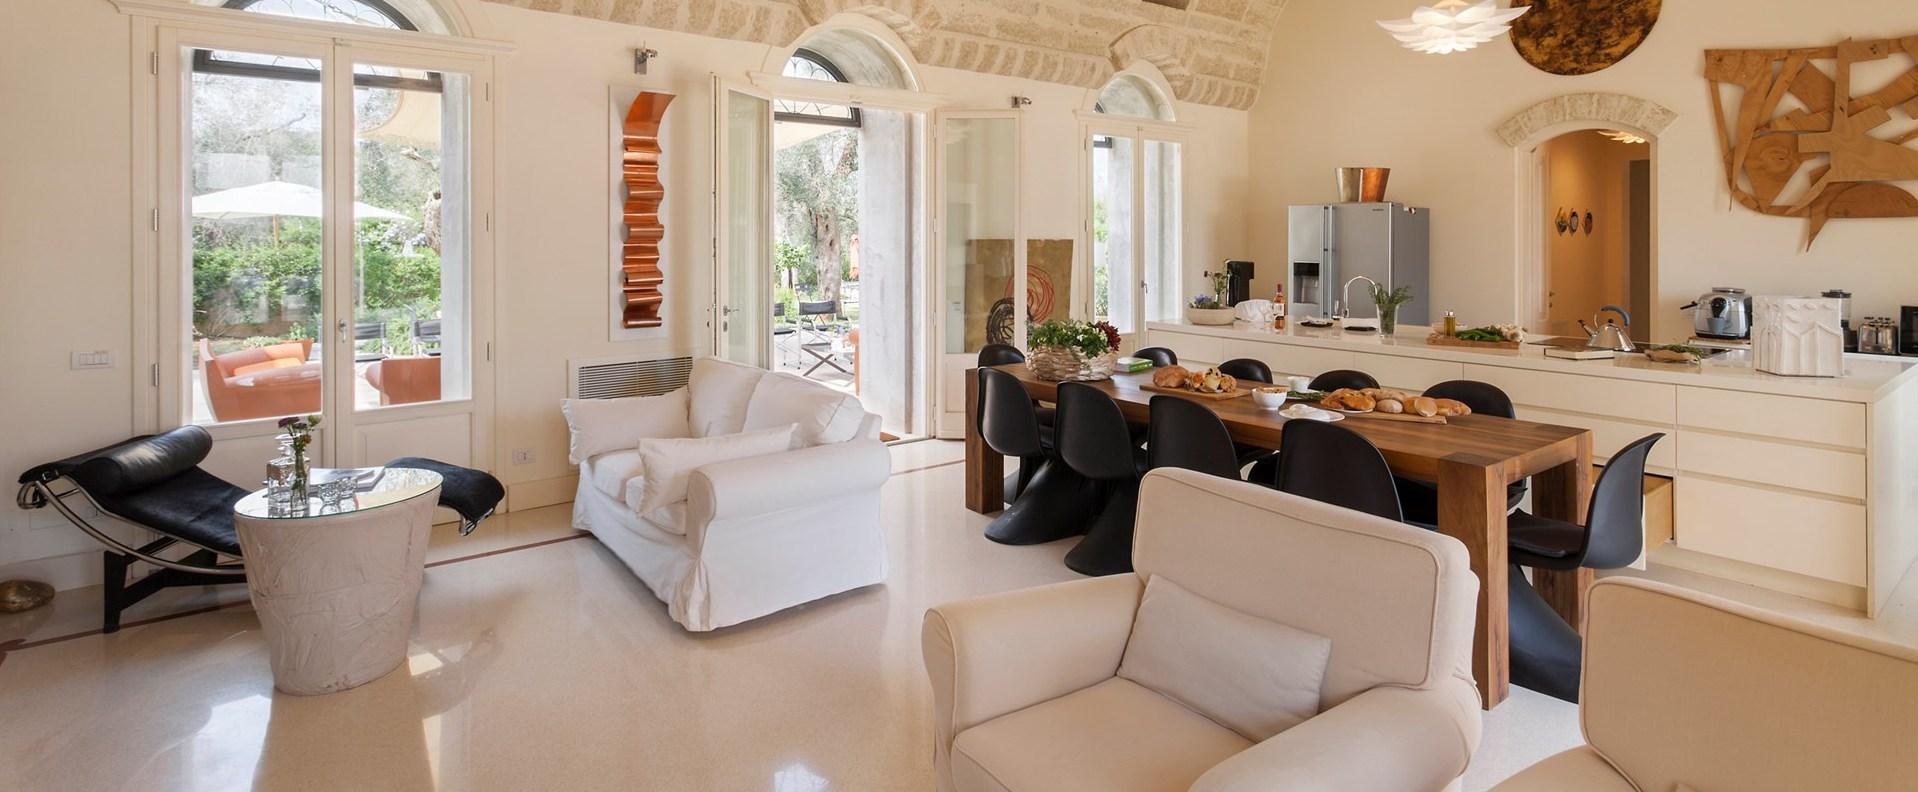 villa-tre-ulivi-puglia-kitchen